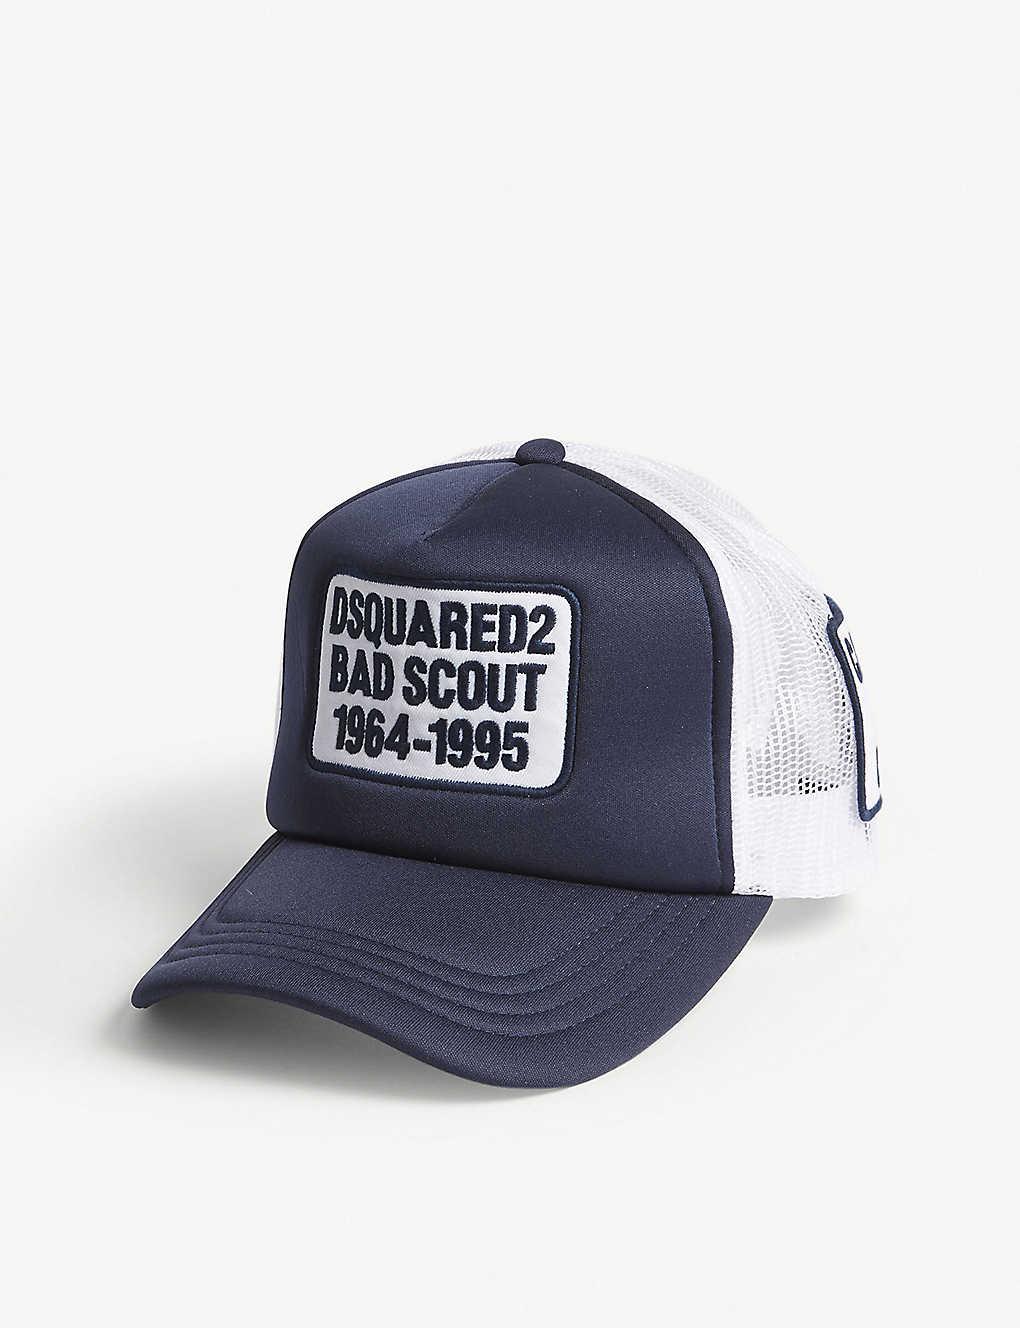 5d2d4775e29 DSQUARED2 - Bad Scout trucker snapback cap